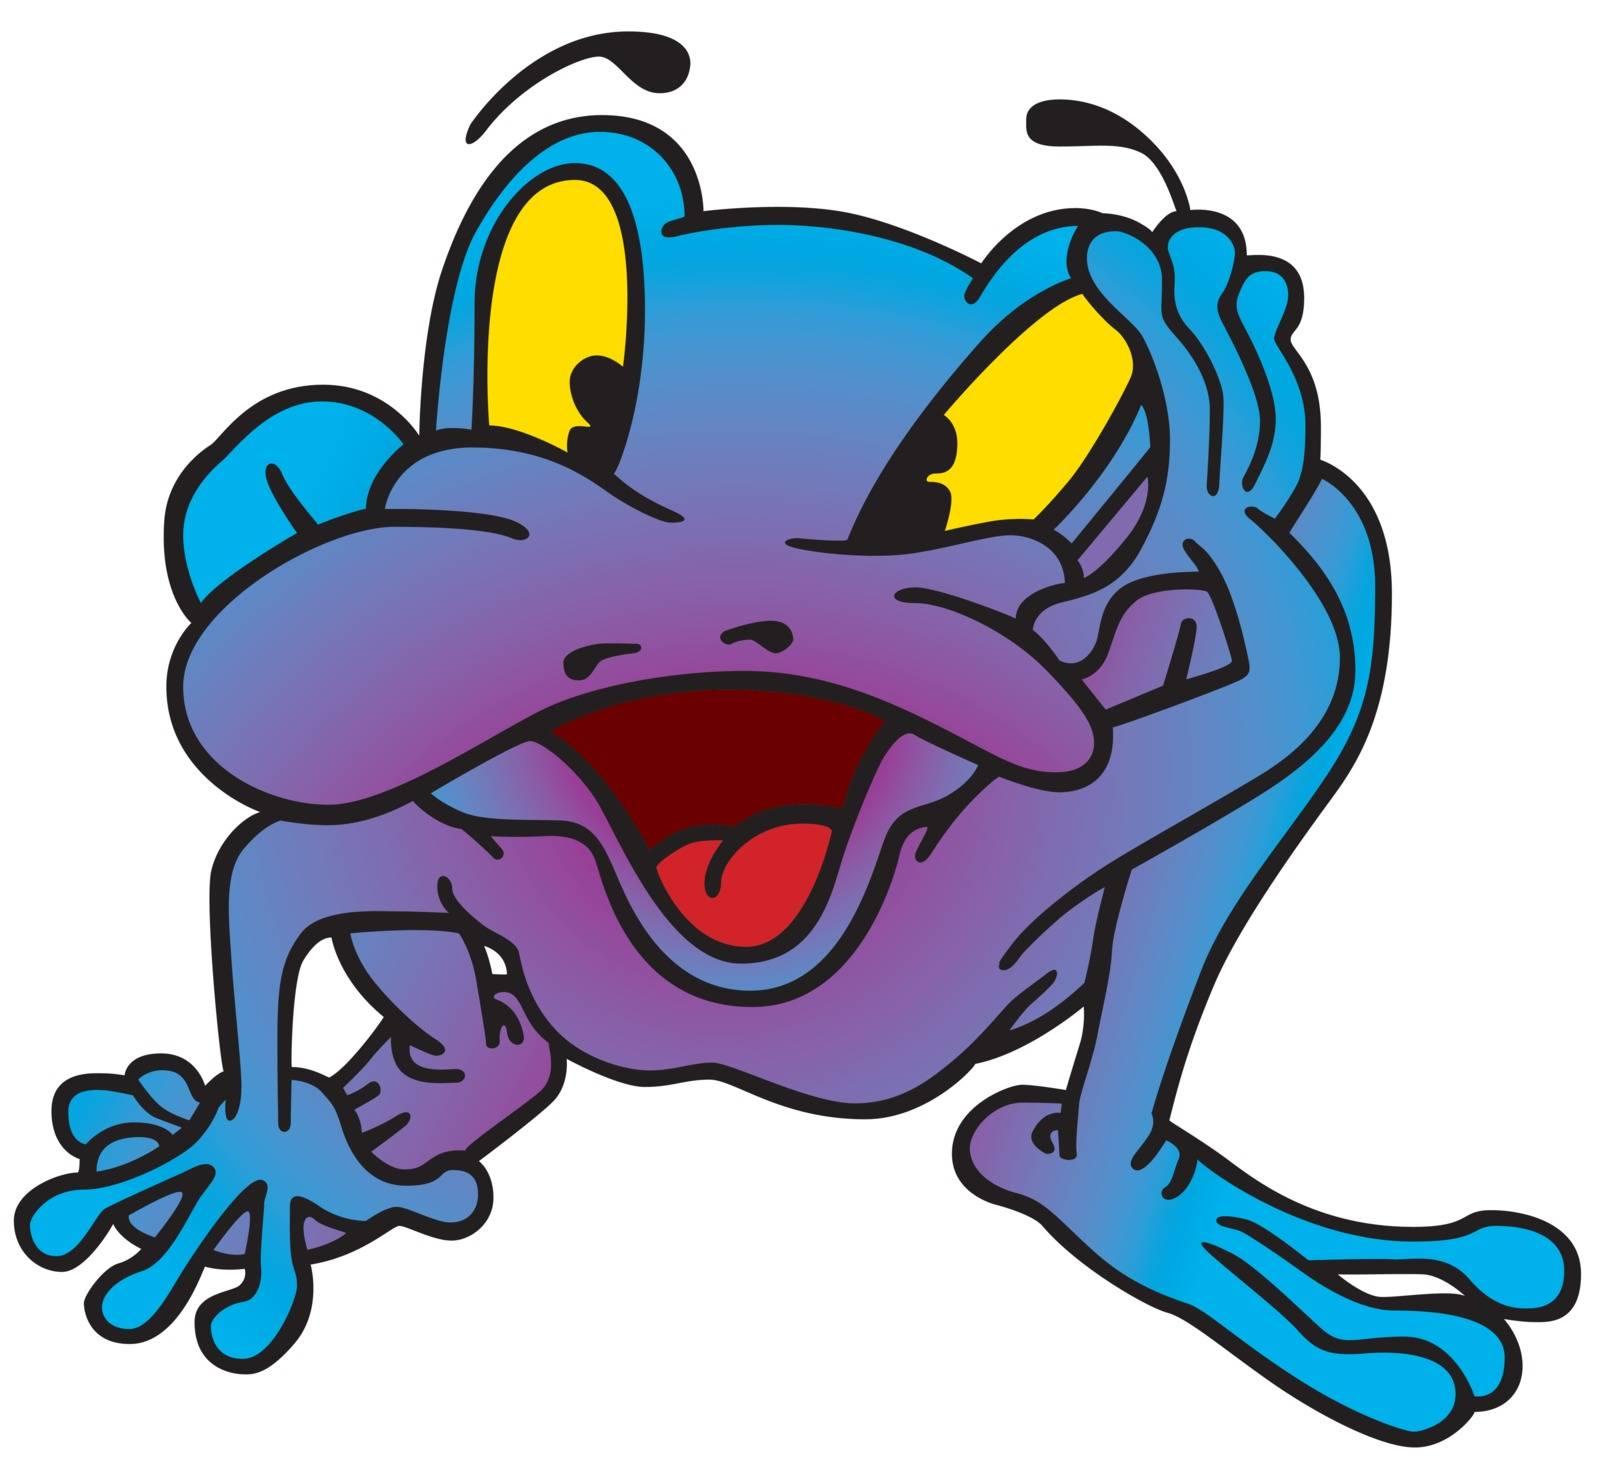 Violet Frog - Colored Cartoon Illustration, Vector